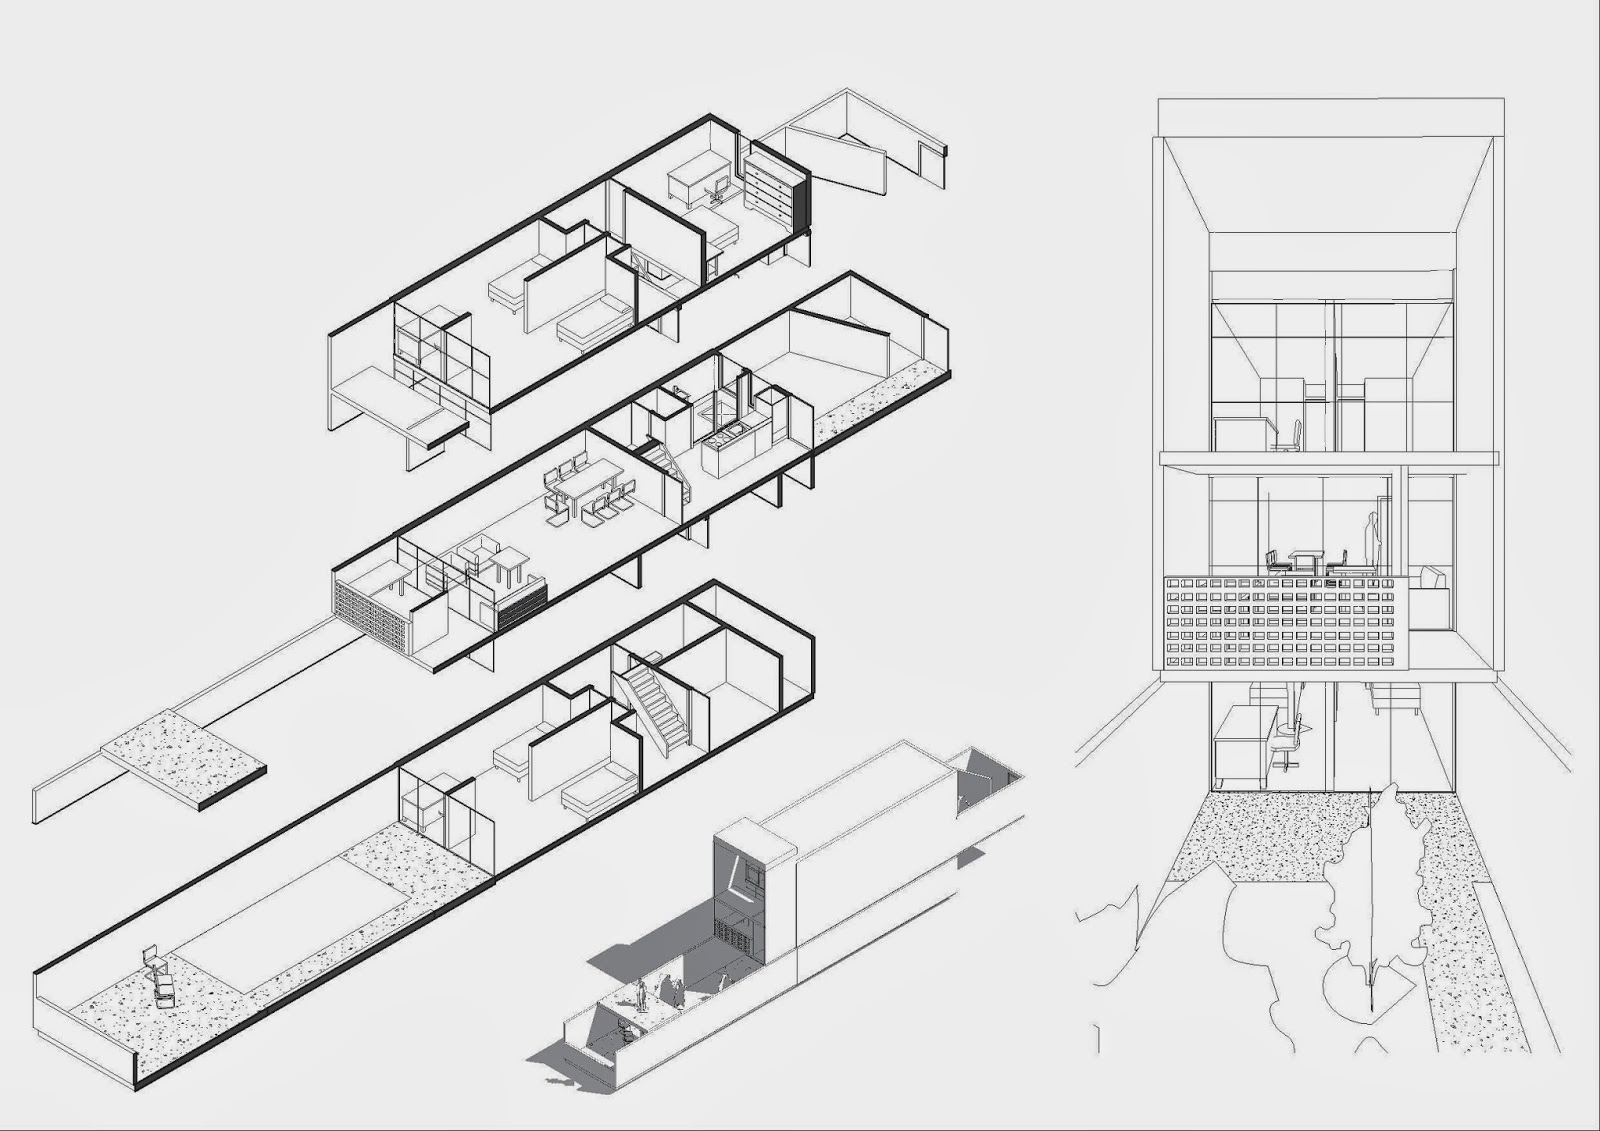 Historia de la arquitectura moderna siedlung halen for Atelier 5 architecture